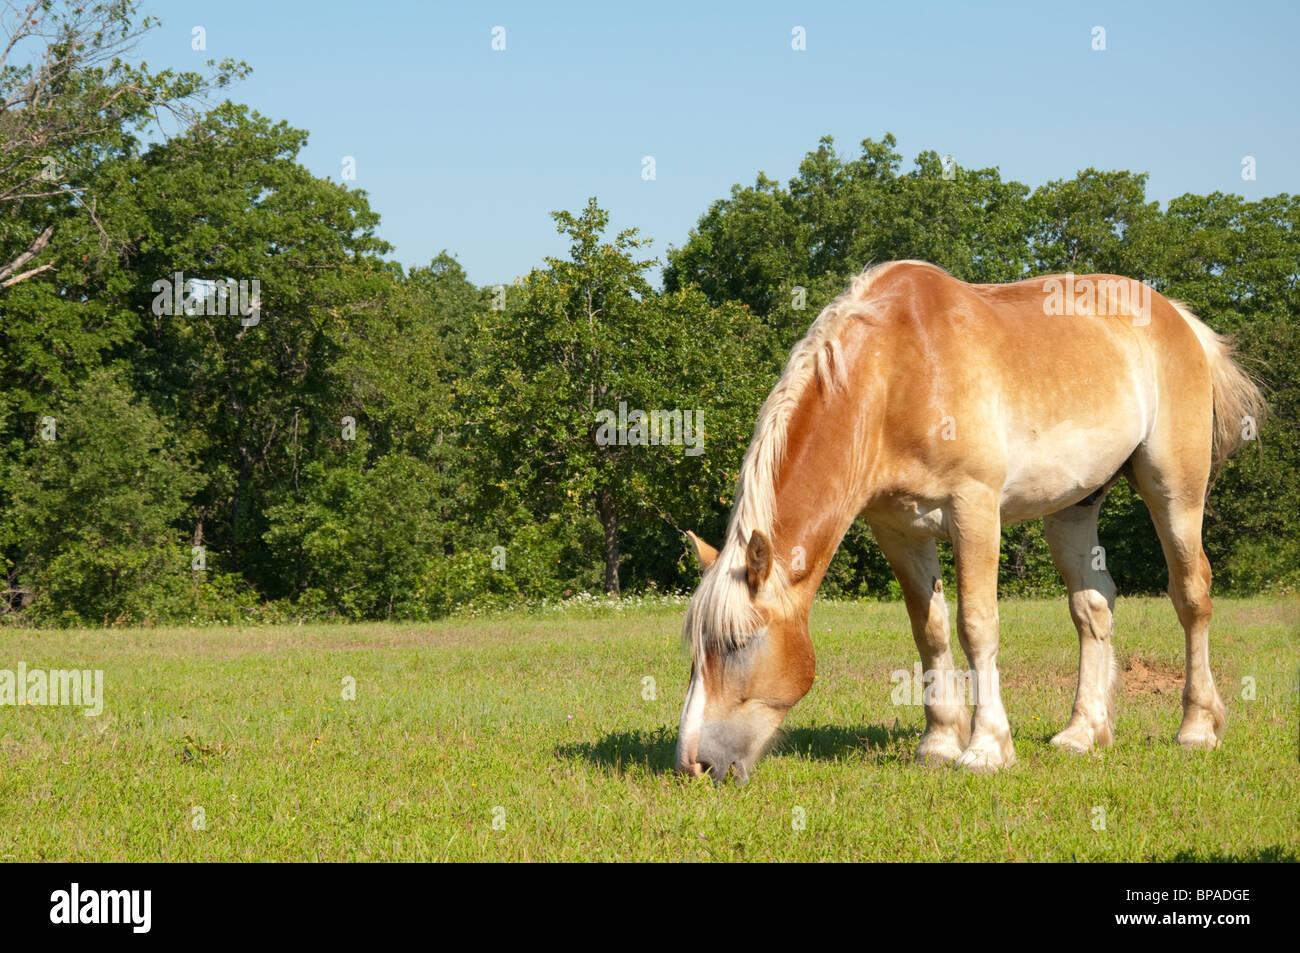 Belgian Draft Horse grazing - Stock Image